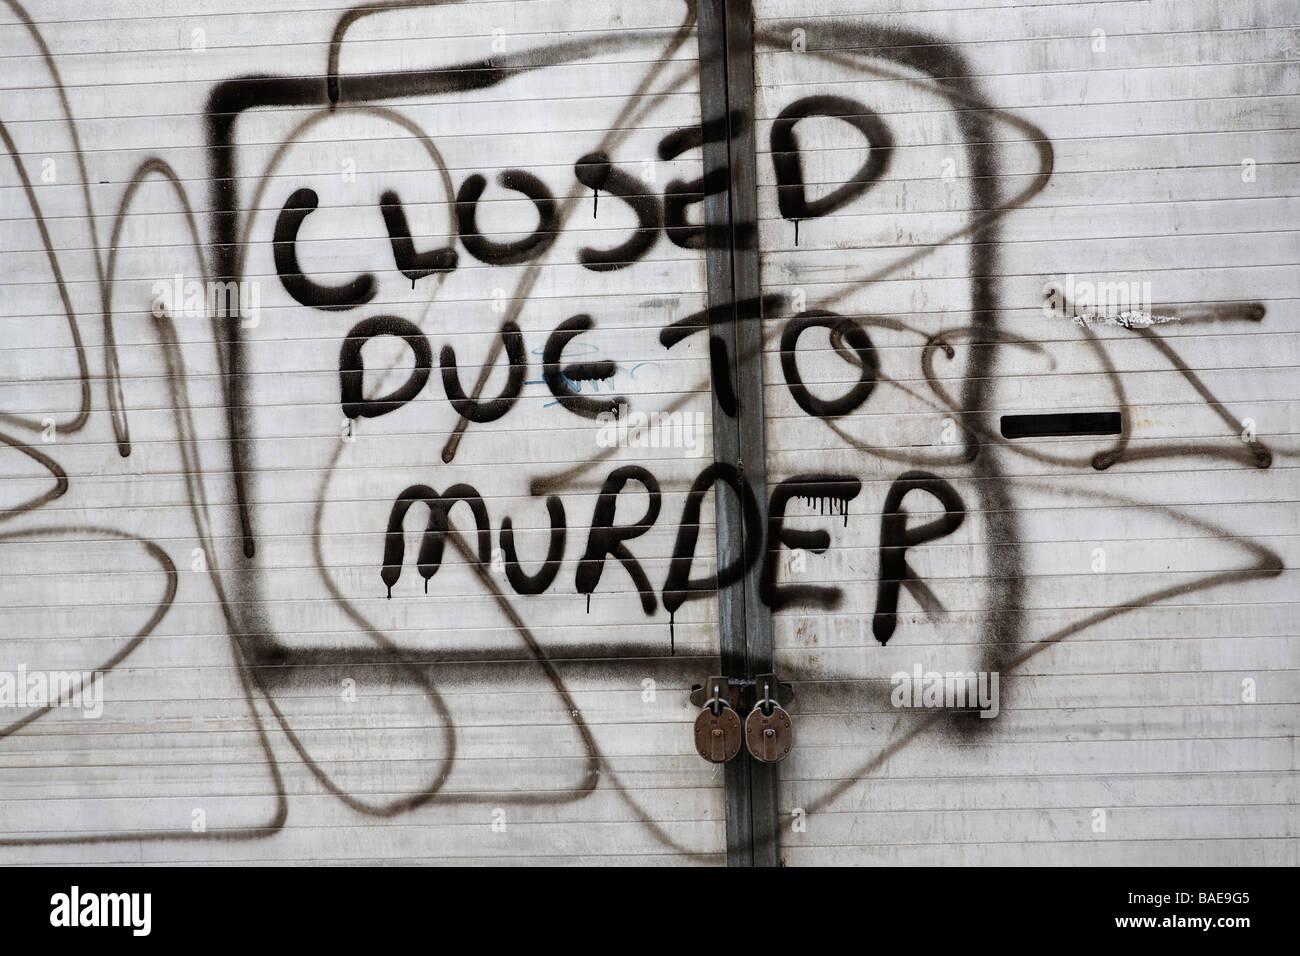 Graffiti shop closed due to murder - Stock Image